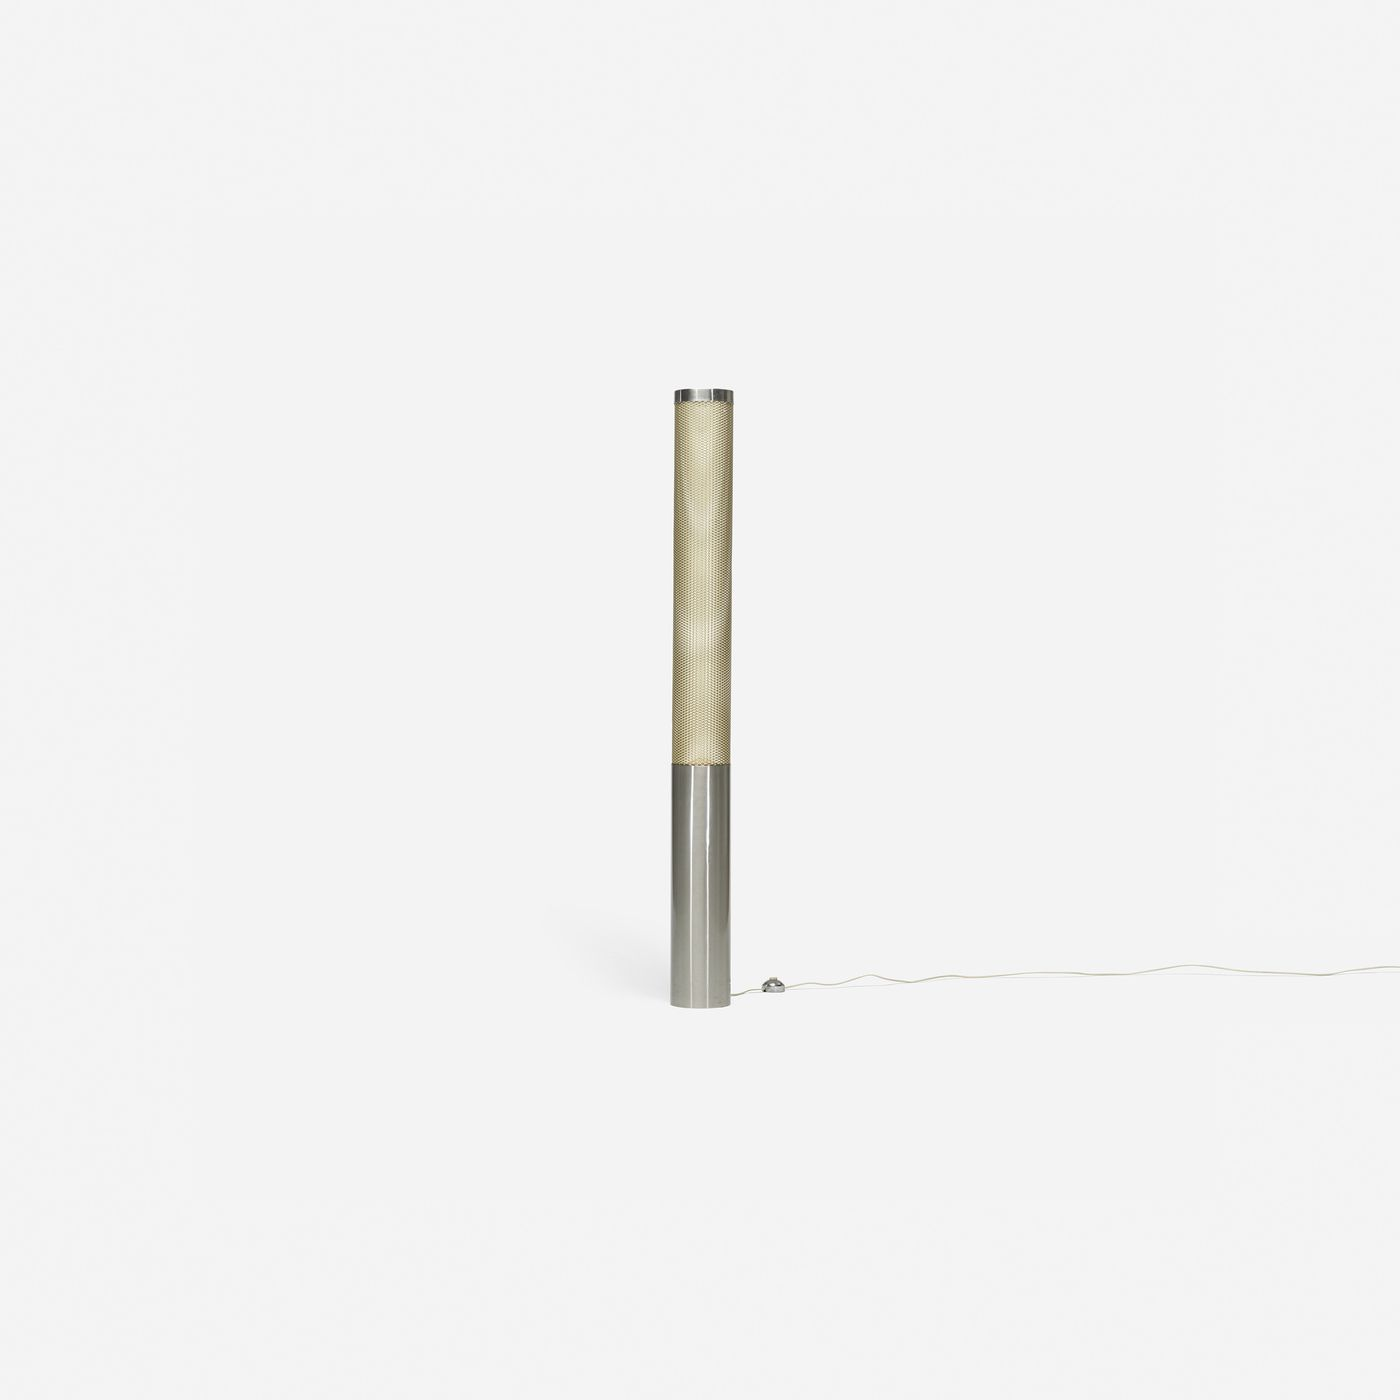 253: Gio Ponti / floor lamp < Design, 23 October 2014 < Auctions | Wright